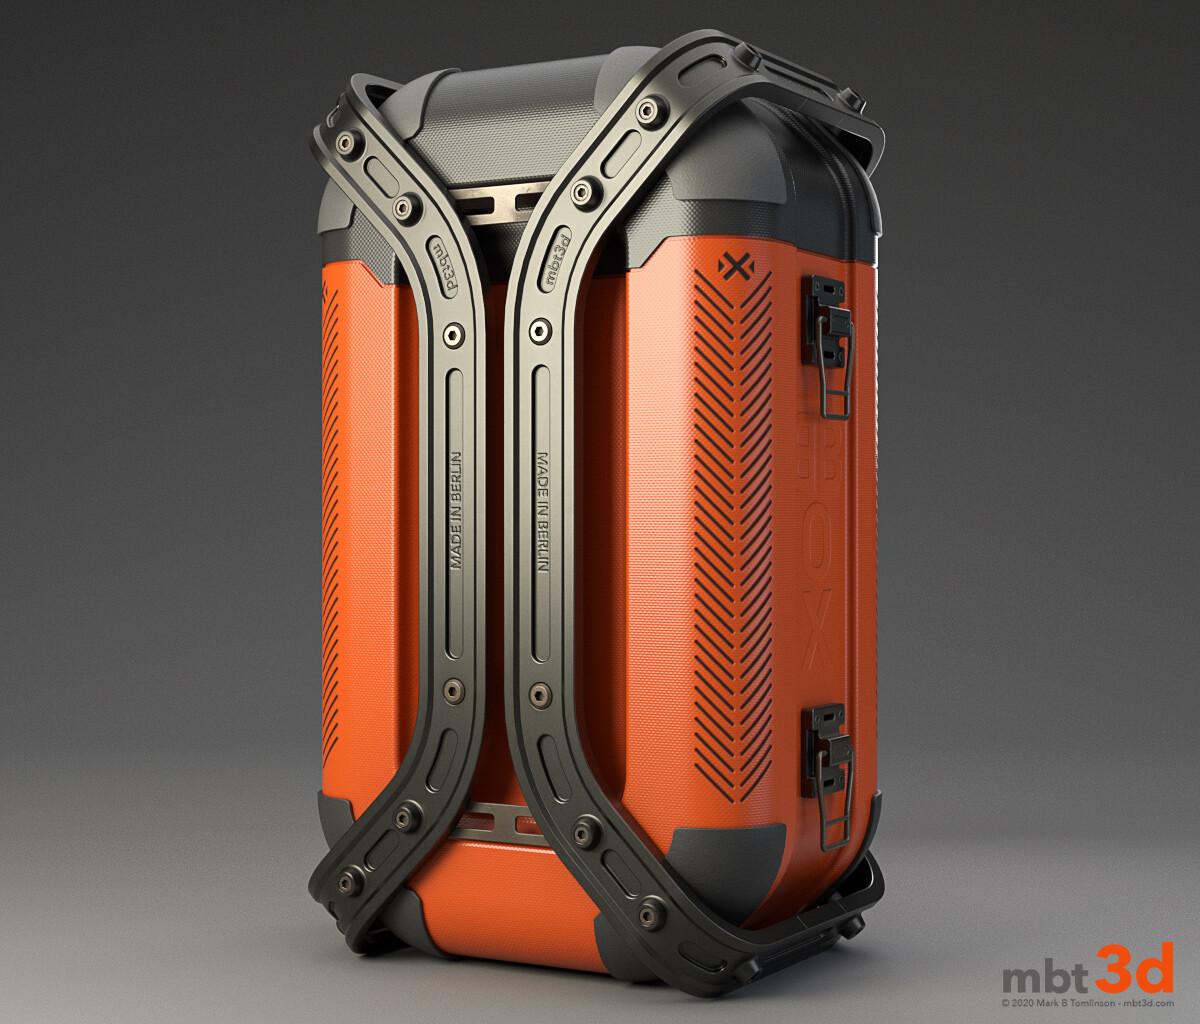 B-Box 1106: